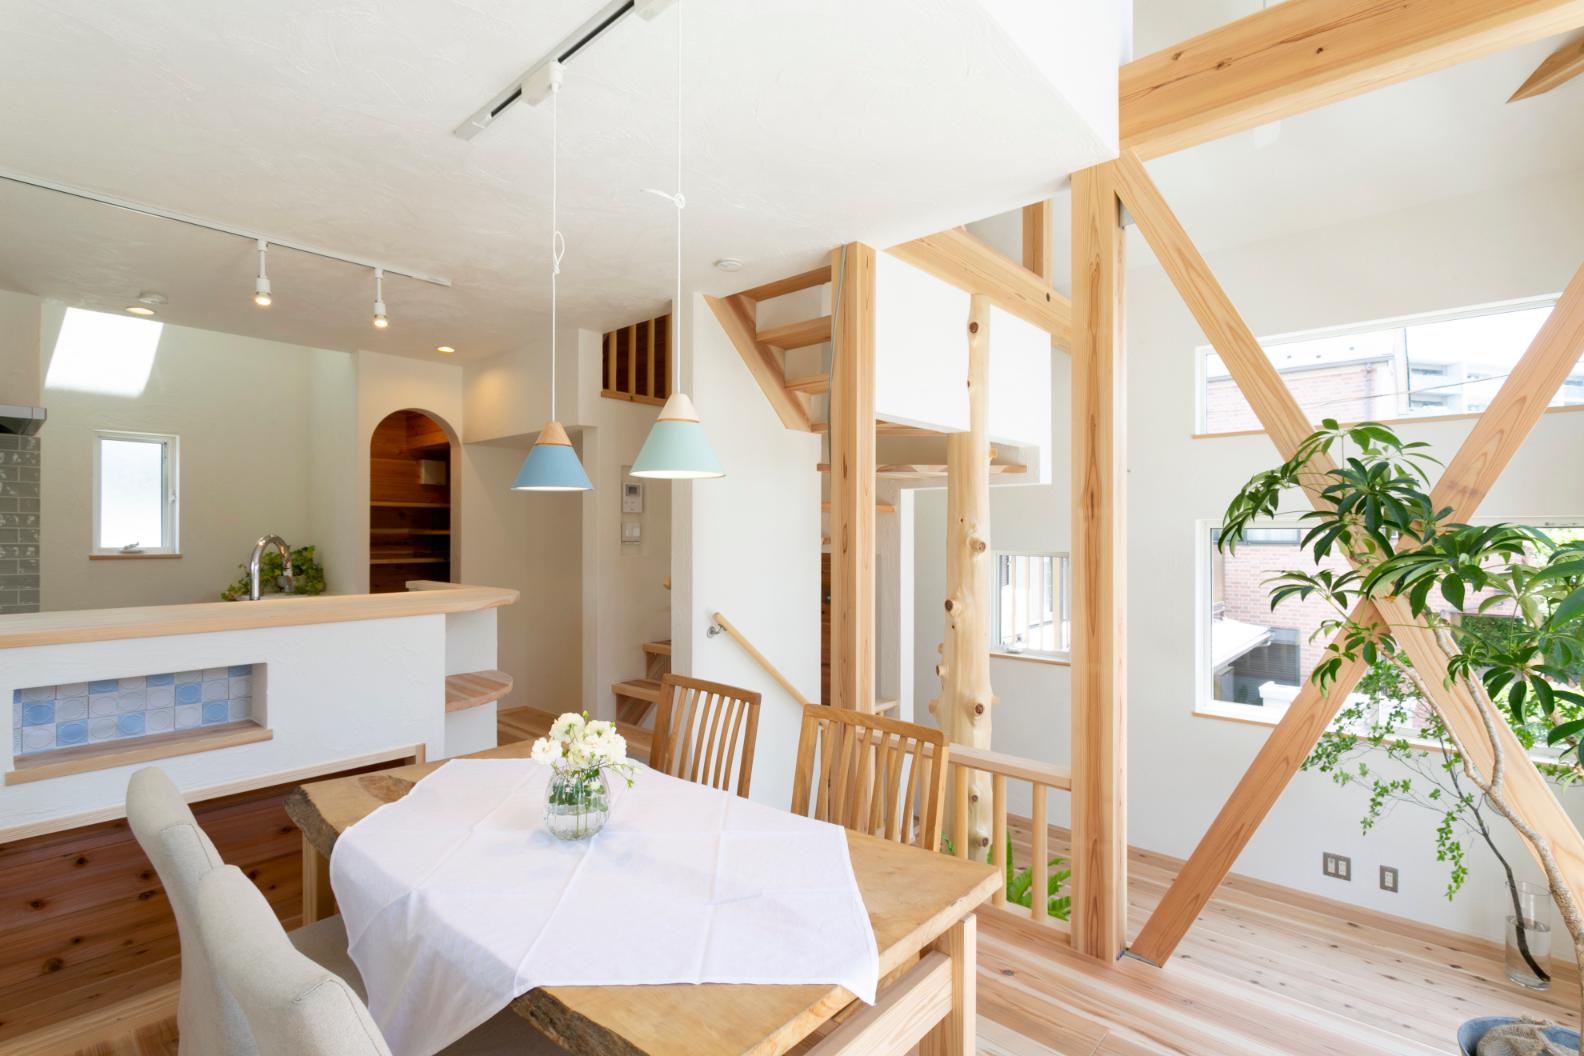 K様邸(平成30年7月完工・横浜市鶴見区)